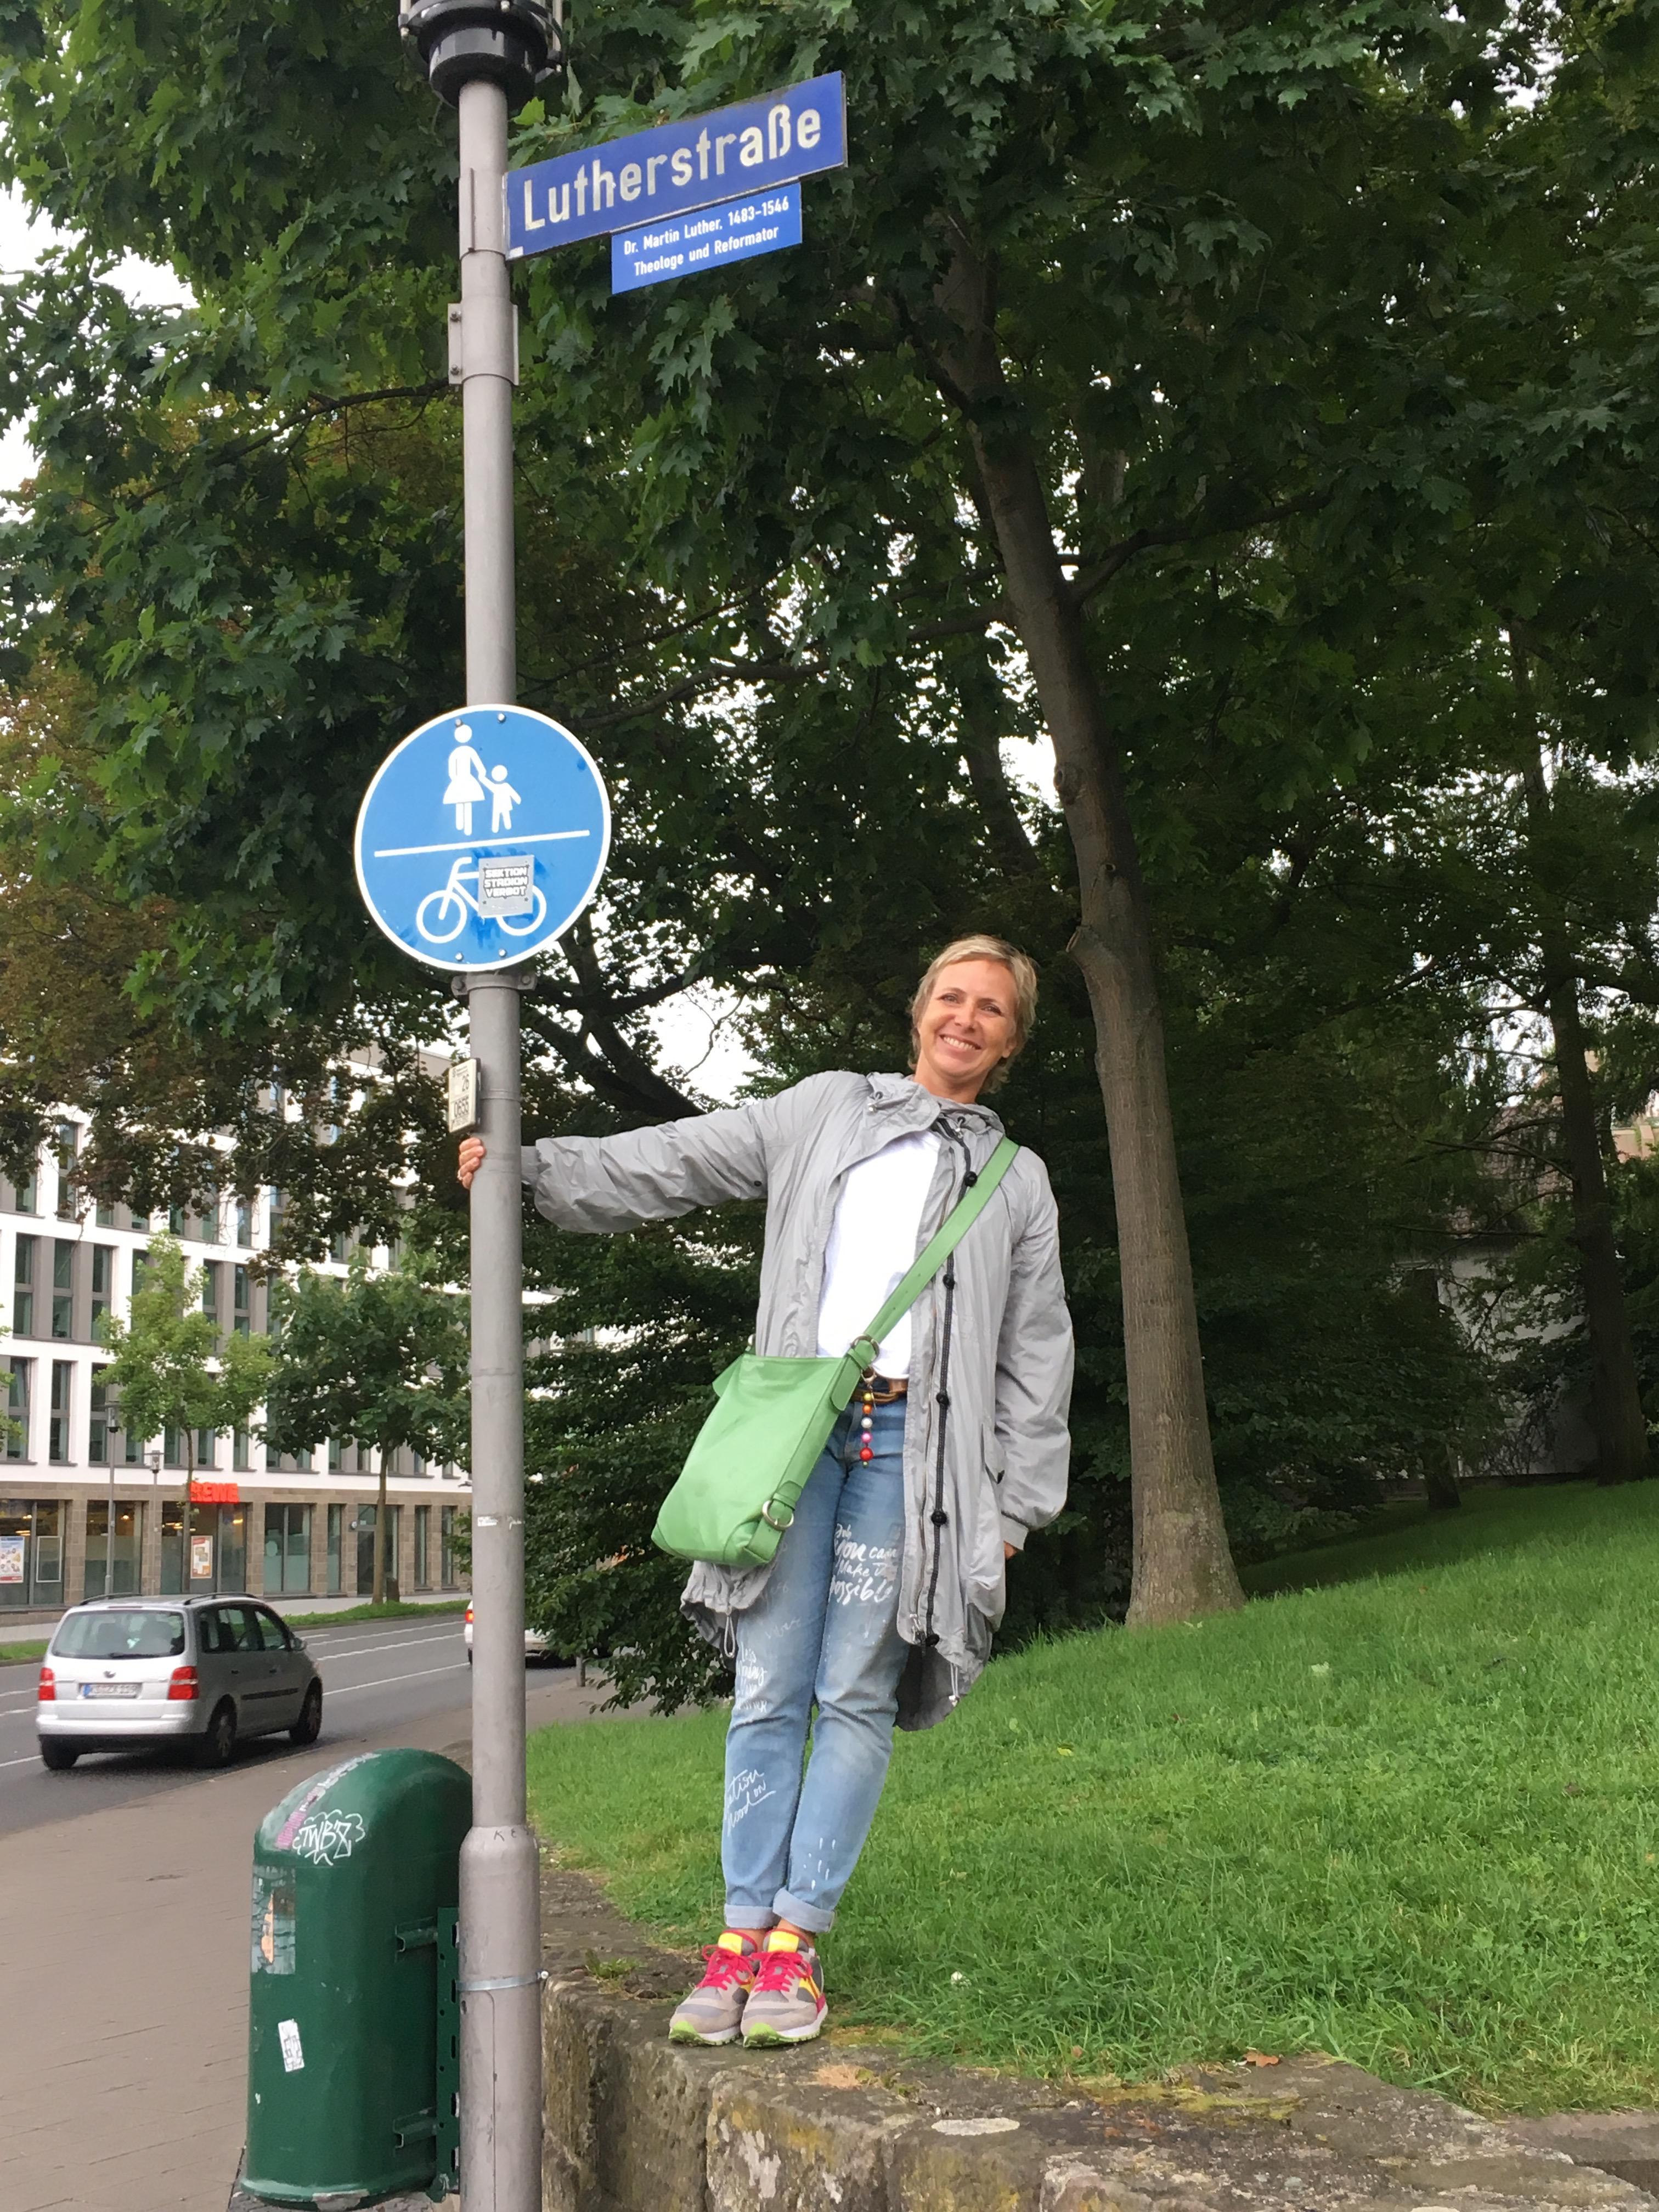 So viel Luther in Kassel